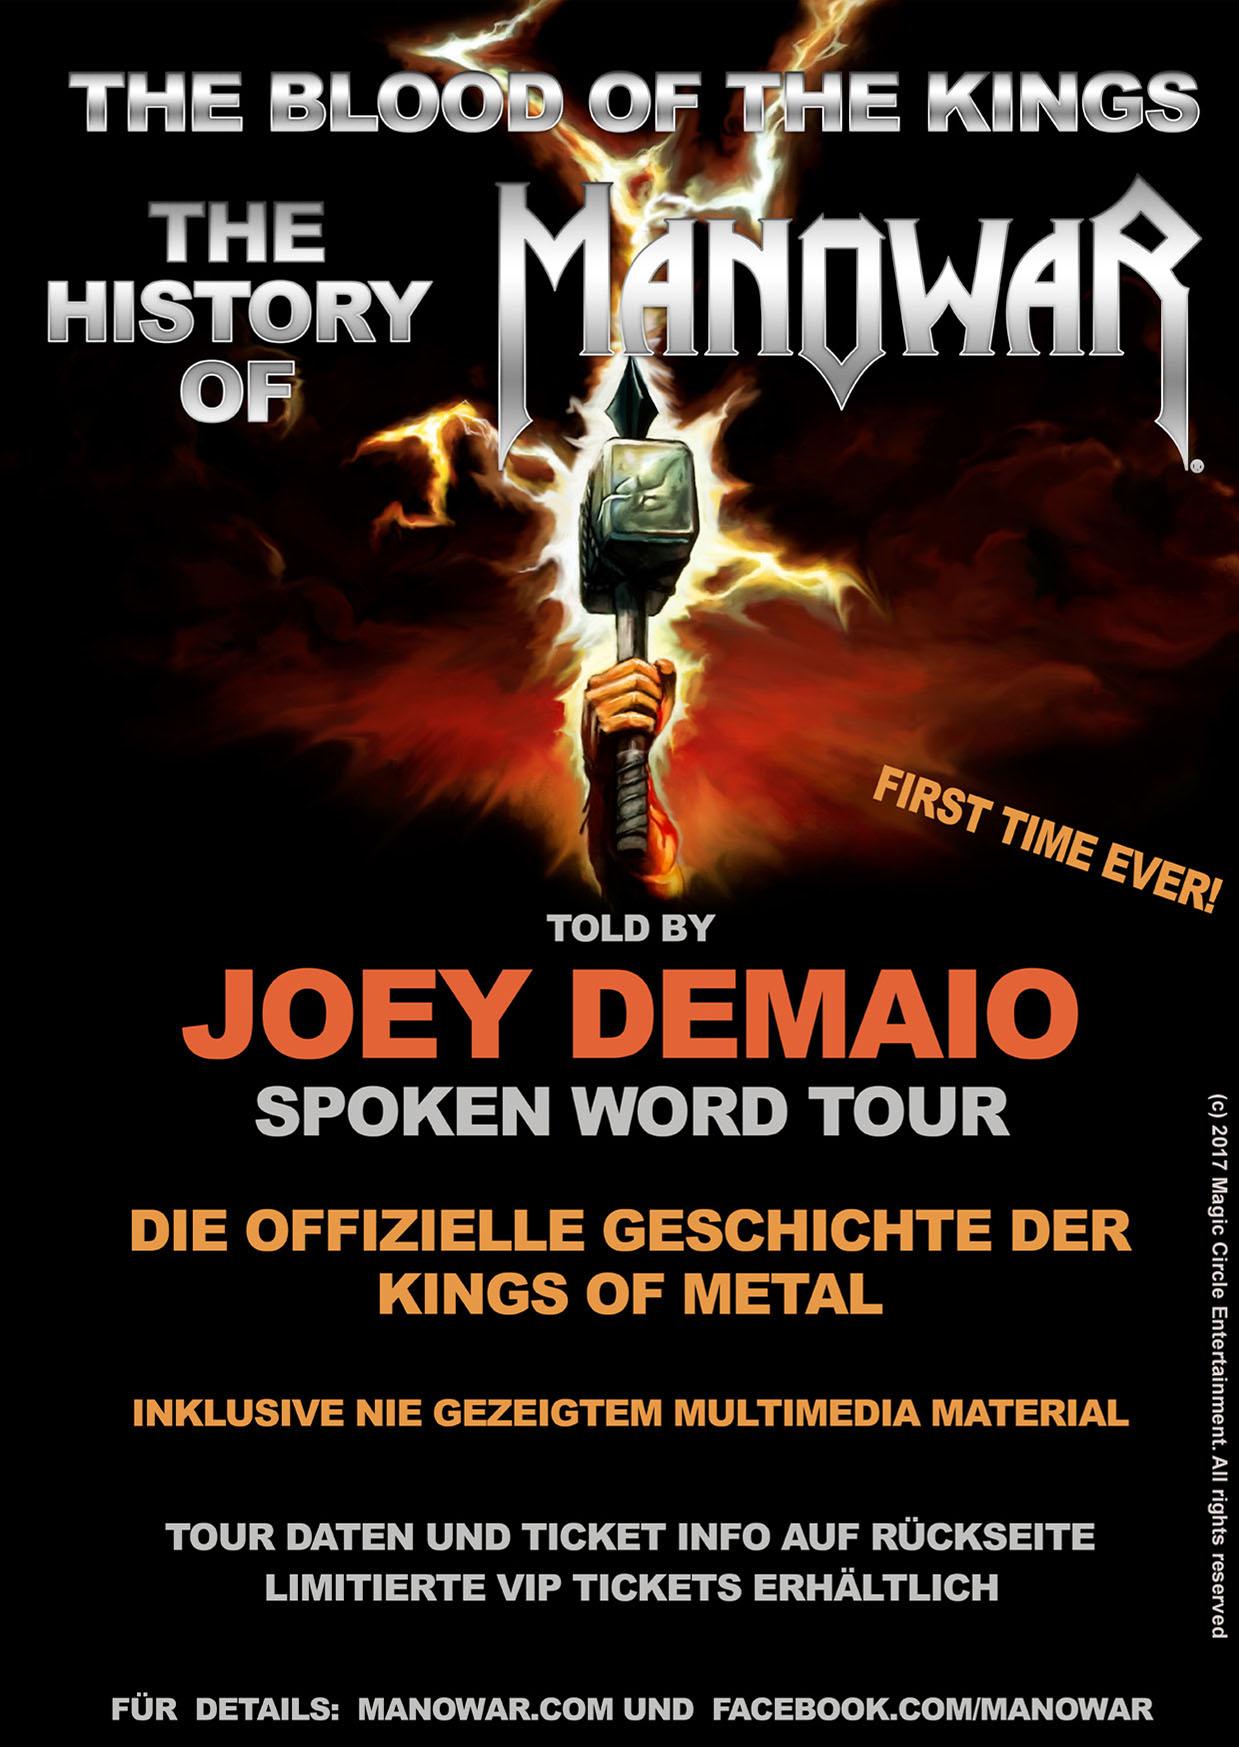 joey demaio tour